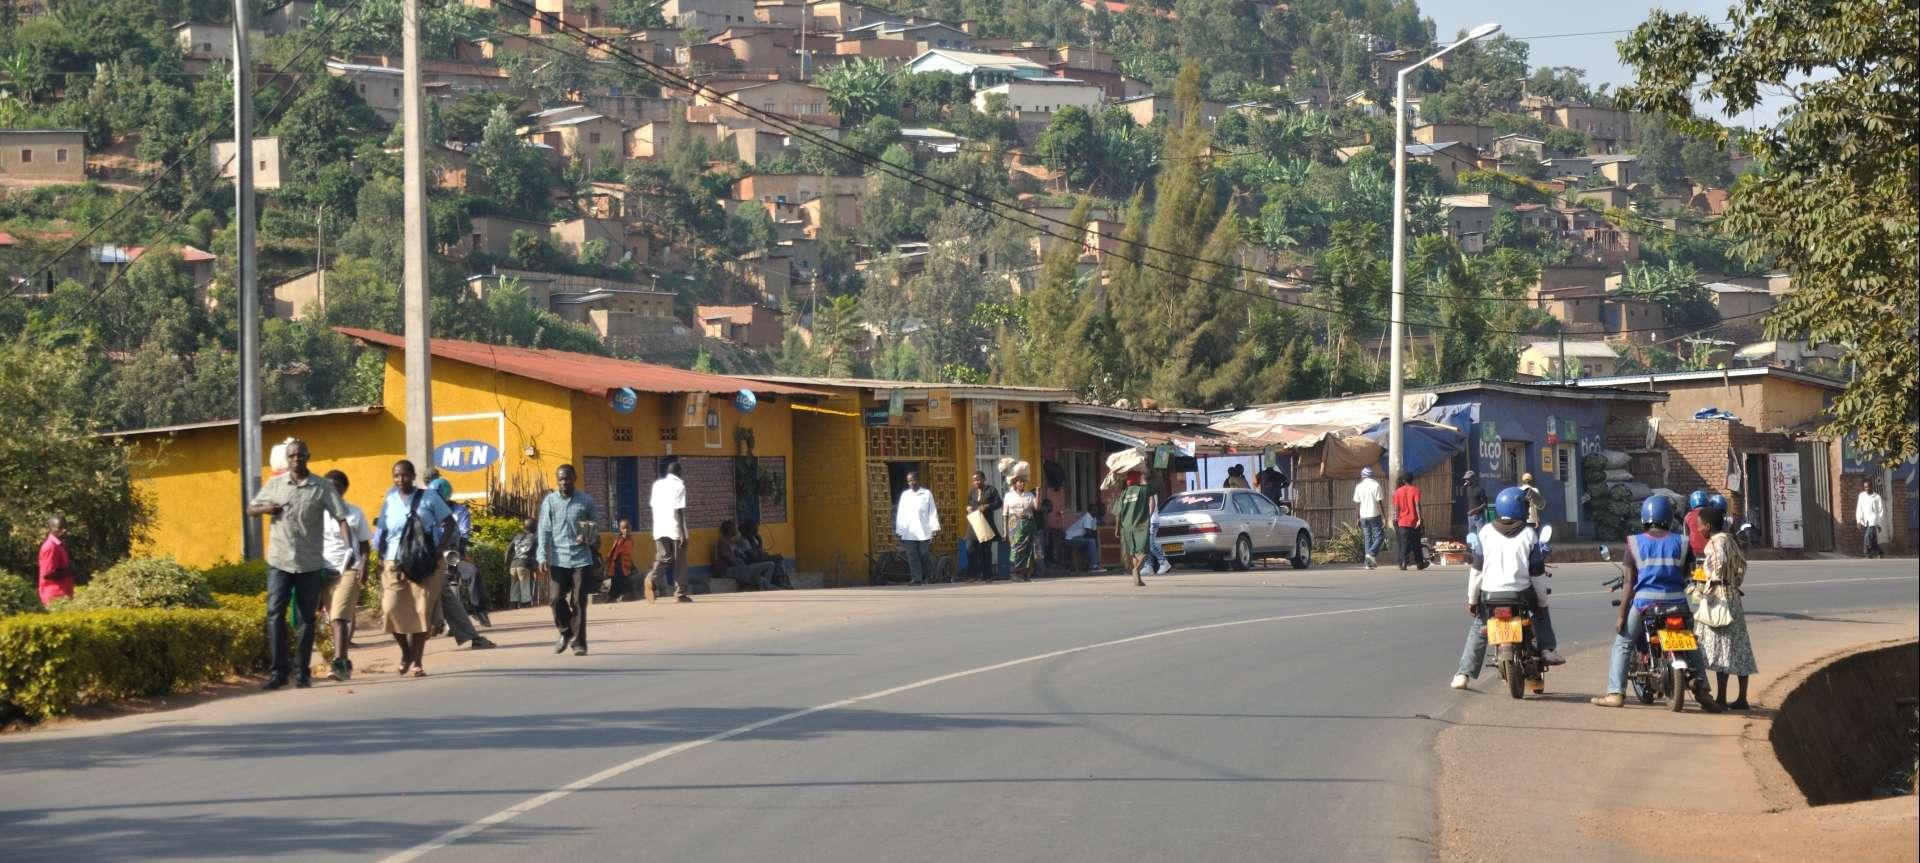 Kigali - Africa Wildlife Safaris